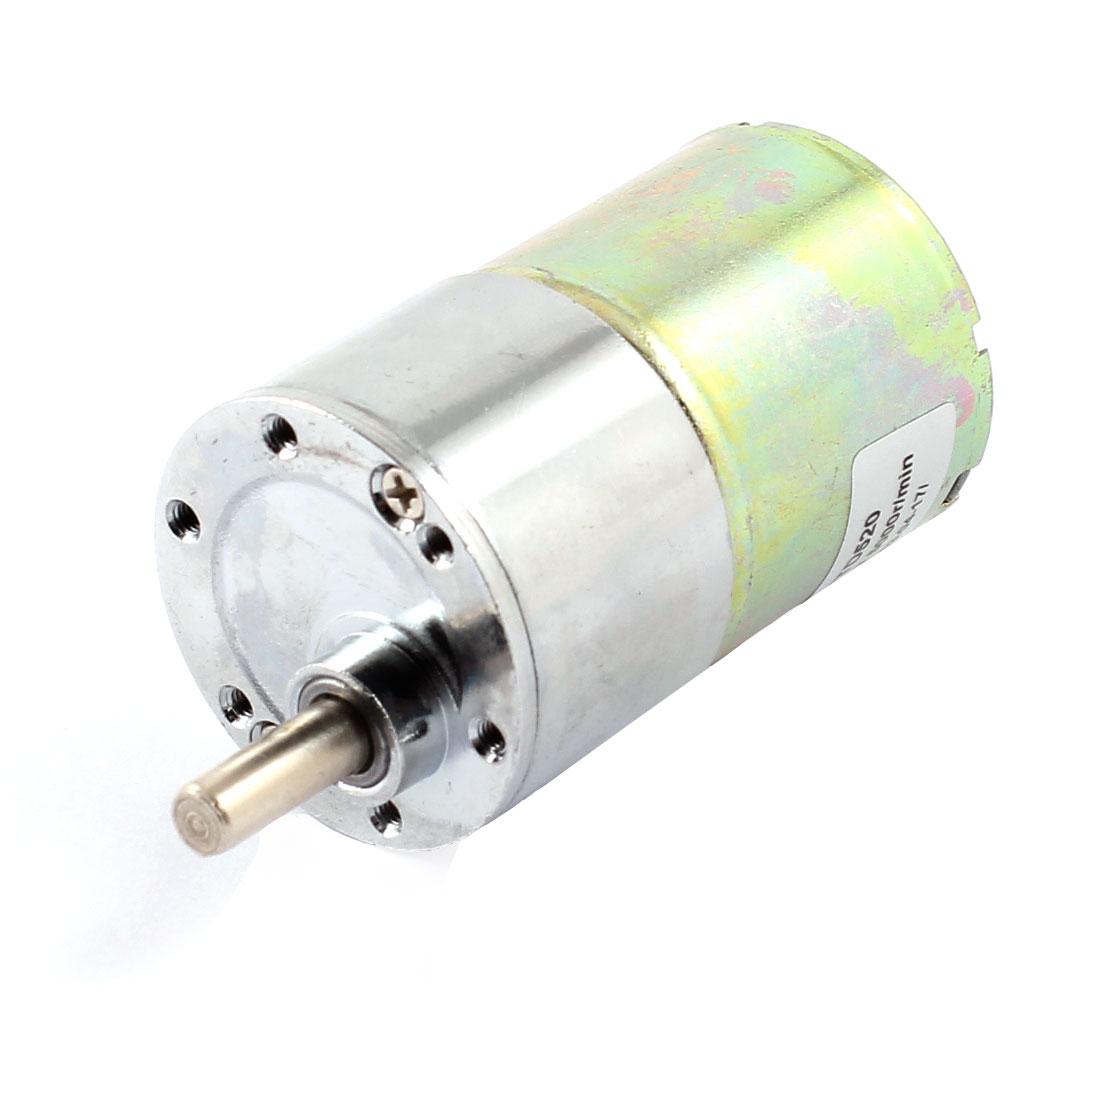 6mm Shaft 35m Body Diameter 2 Connector Cylinder Shape Gear Box Motor DC12V 5000R/MIN